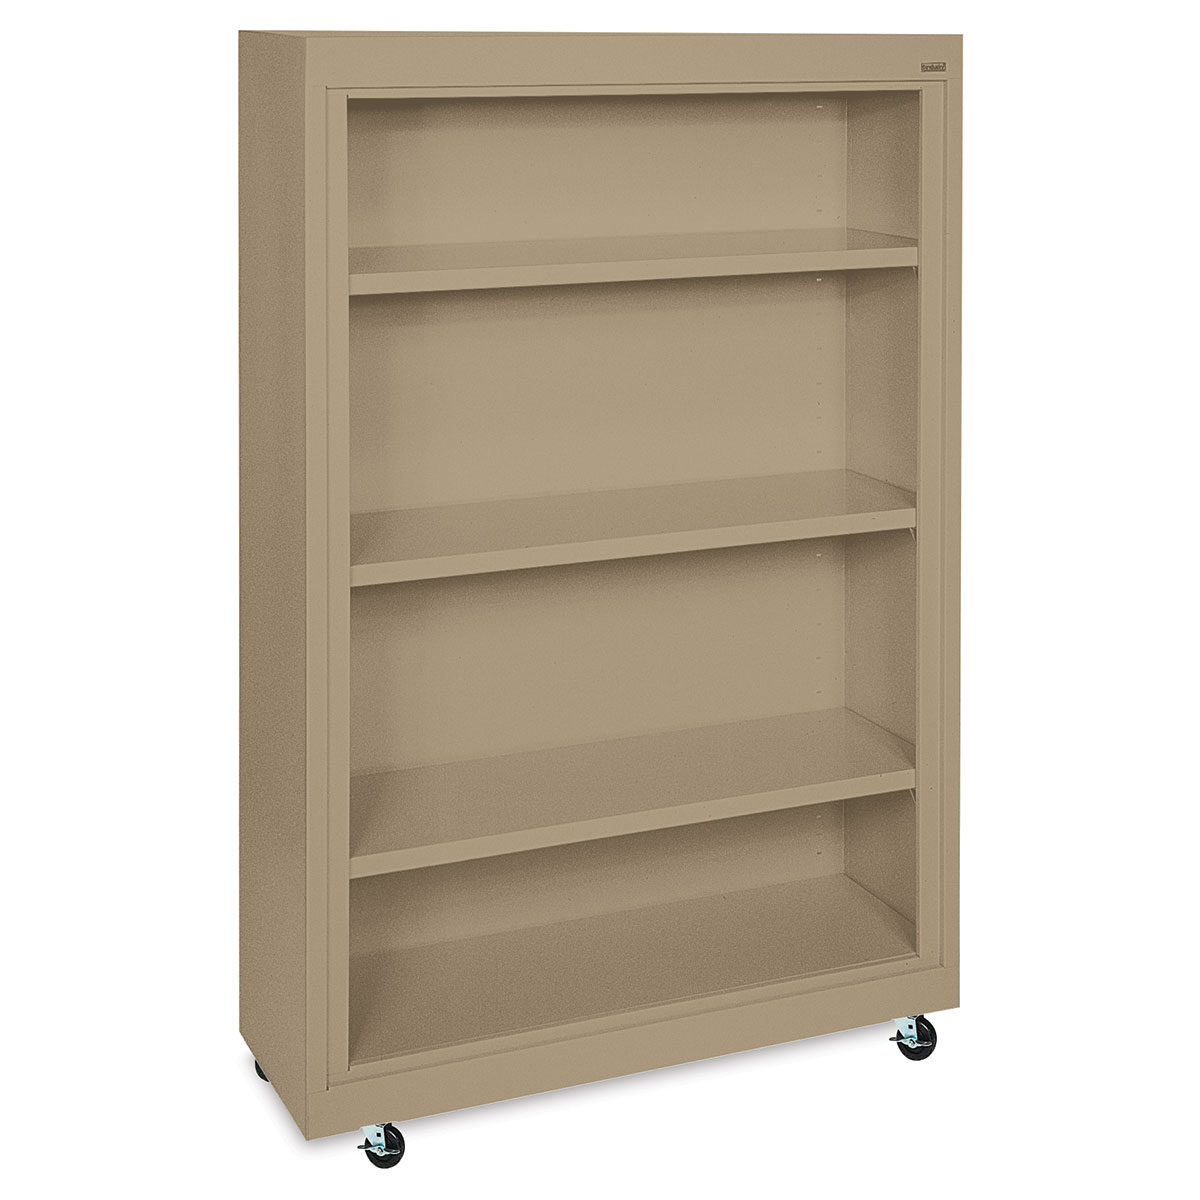 Sandusky Lee Mobile Bookcase - 36 x 58 x 18, Tropic Sand